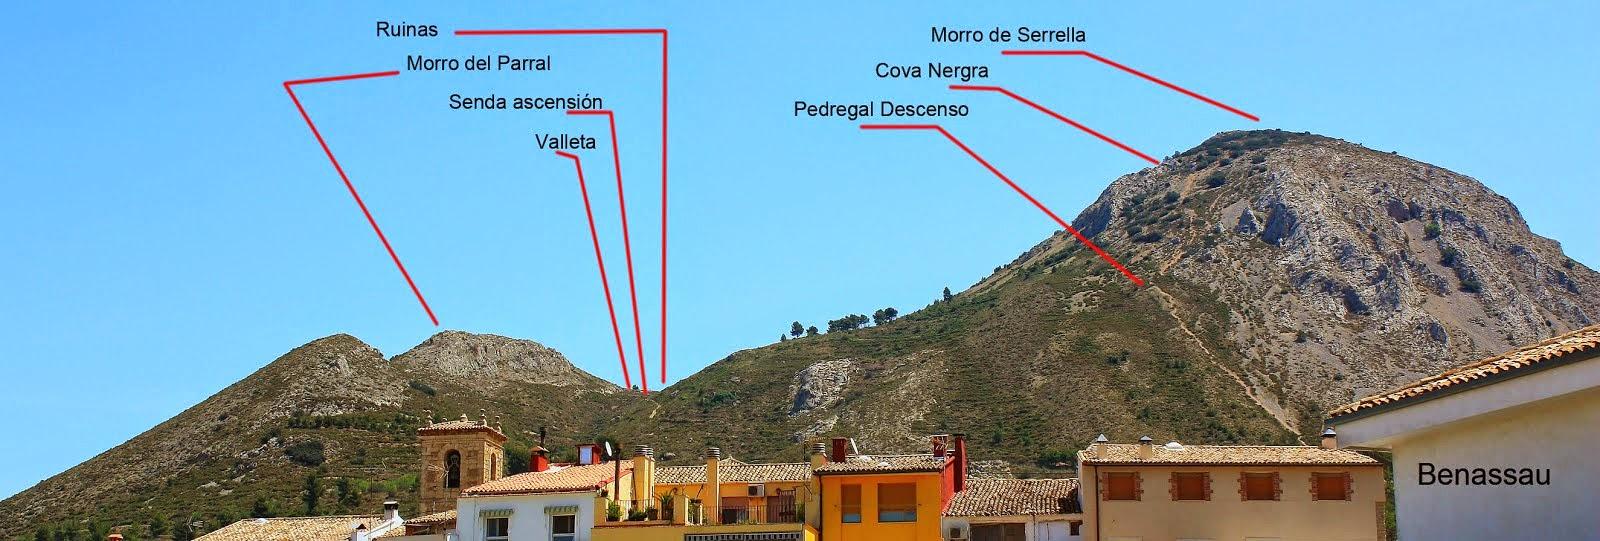 Morro de Serrella